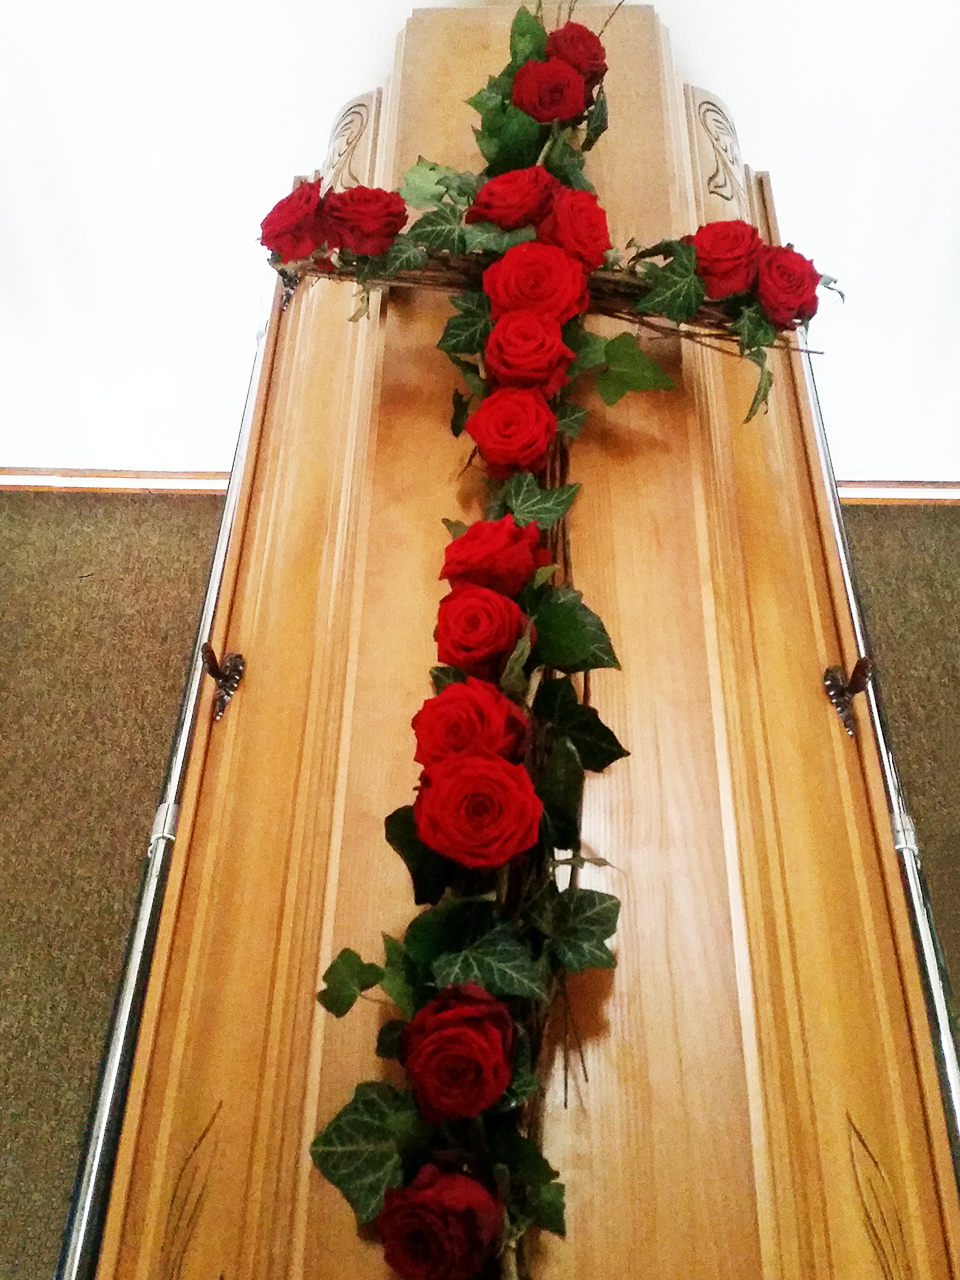 Andrea Czech Blumen und Bestattungen UG